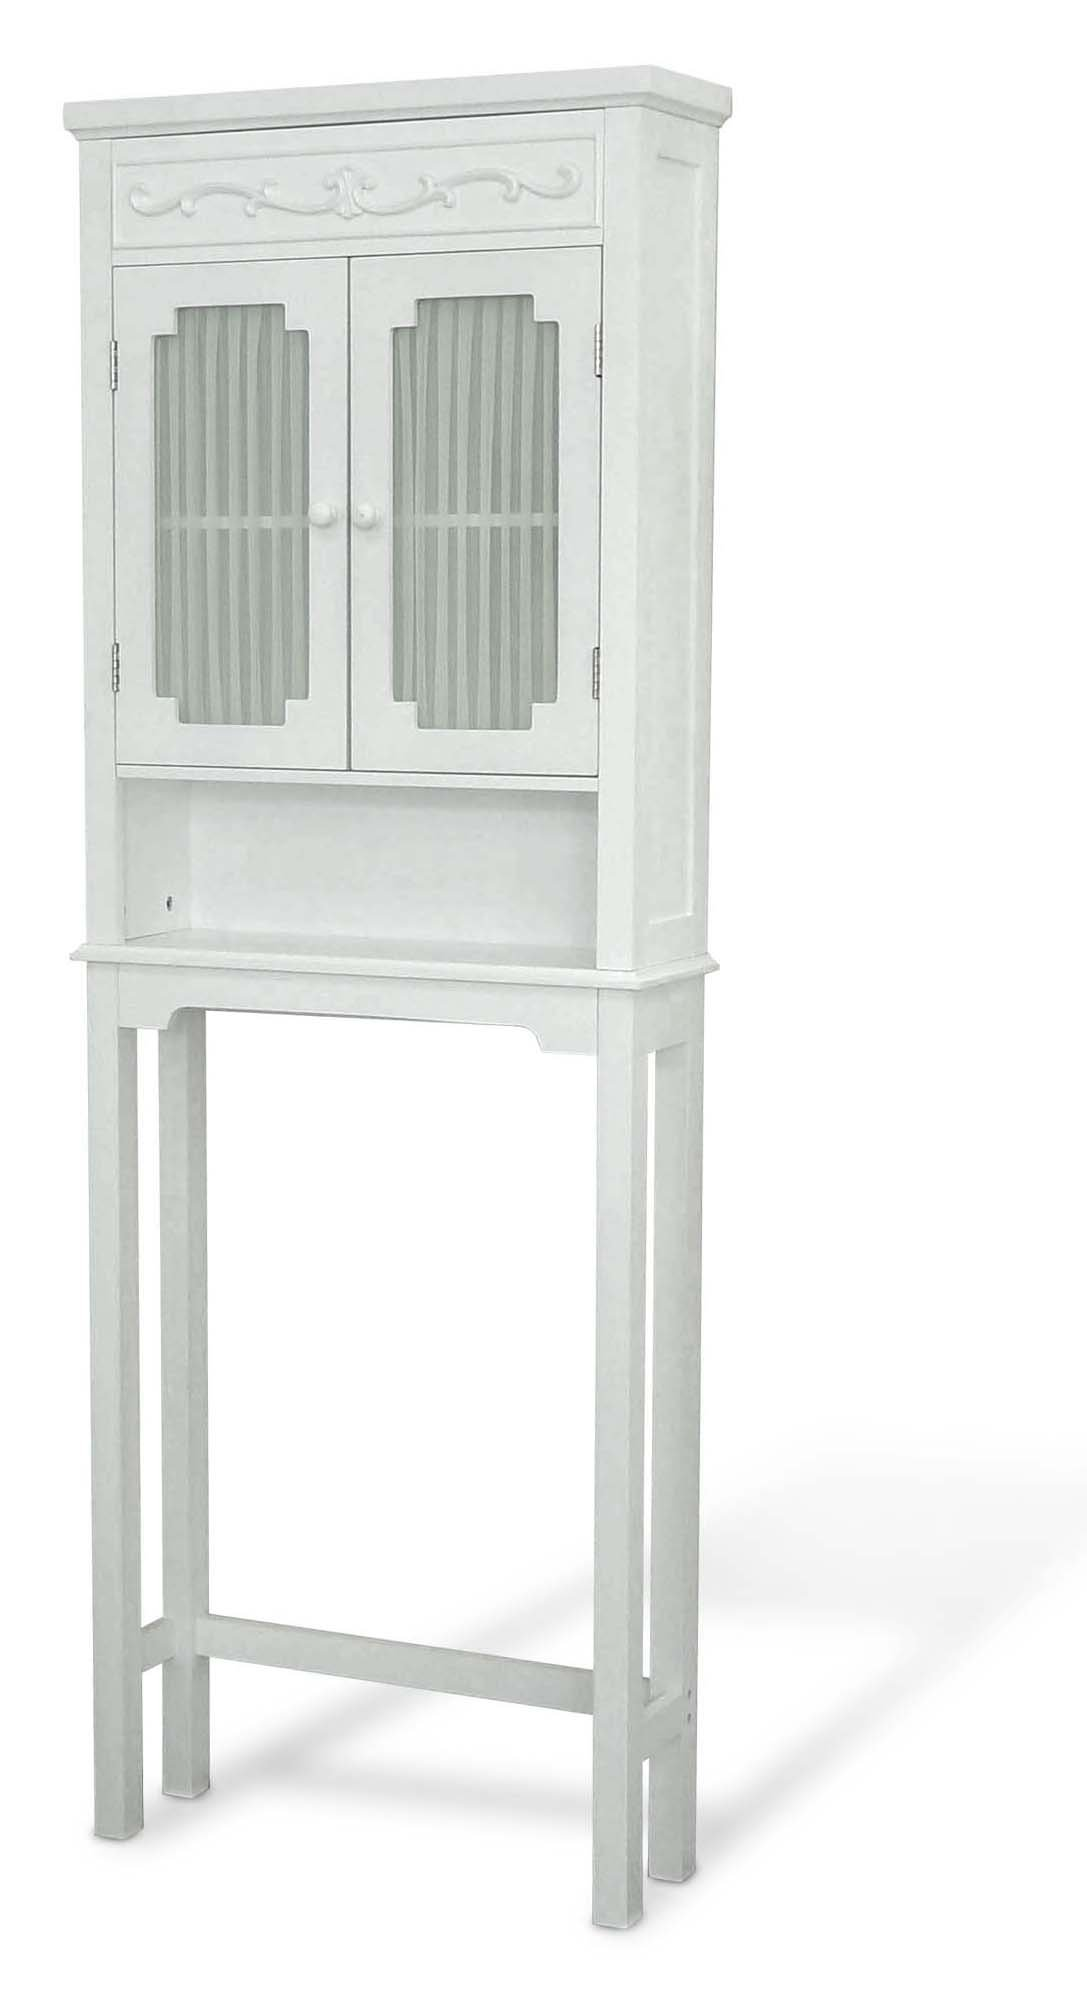 Elegant Home Fashions Lisbon Collection Shelved Bathroom Space-Saver, White by Elegant Home Fashions